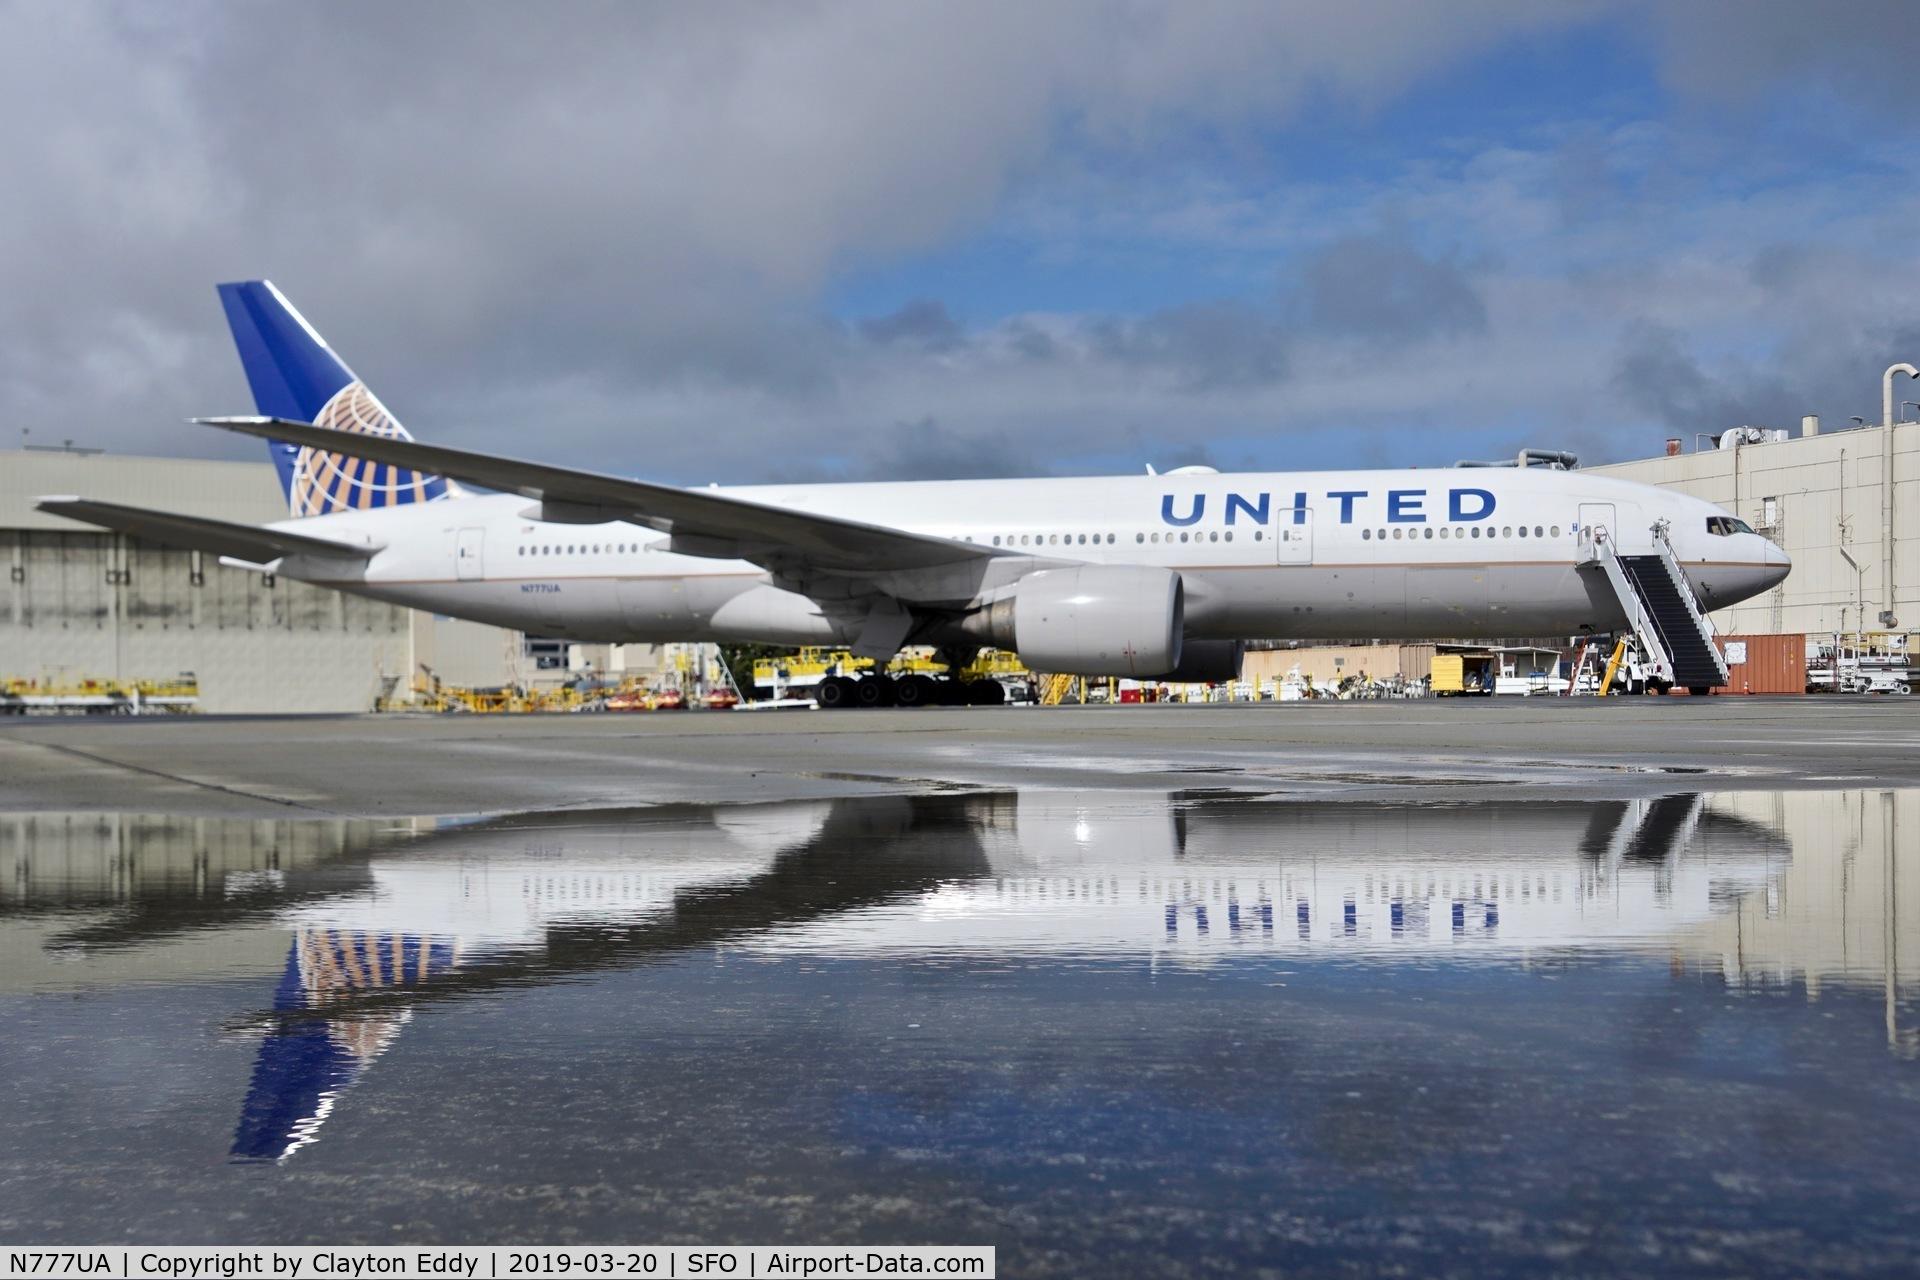 N777UA, 1995 Boeing 777-222 C/N 26916, SFO 2019.